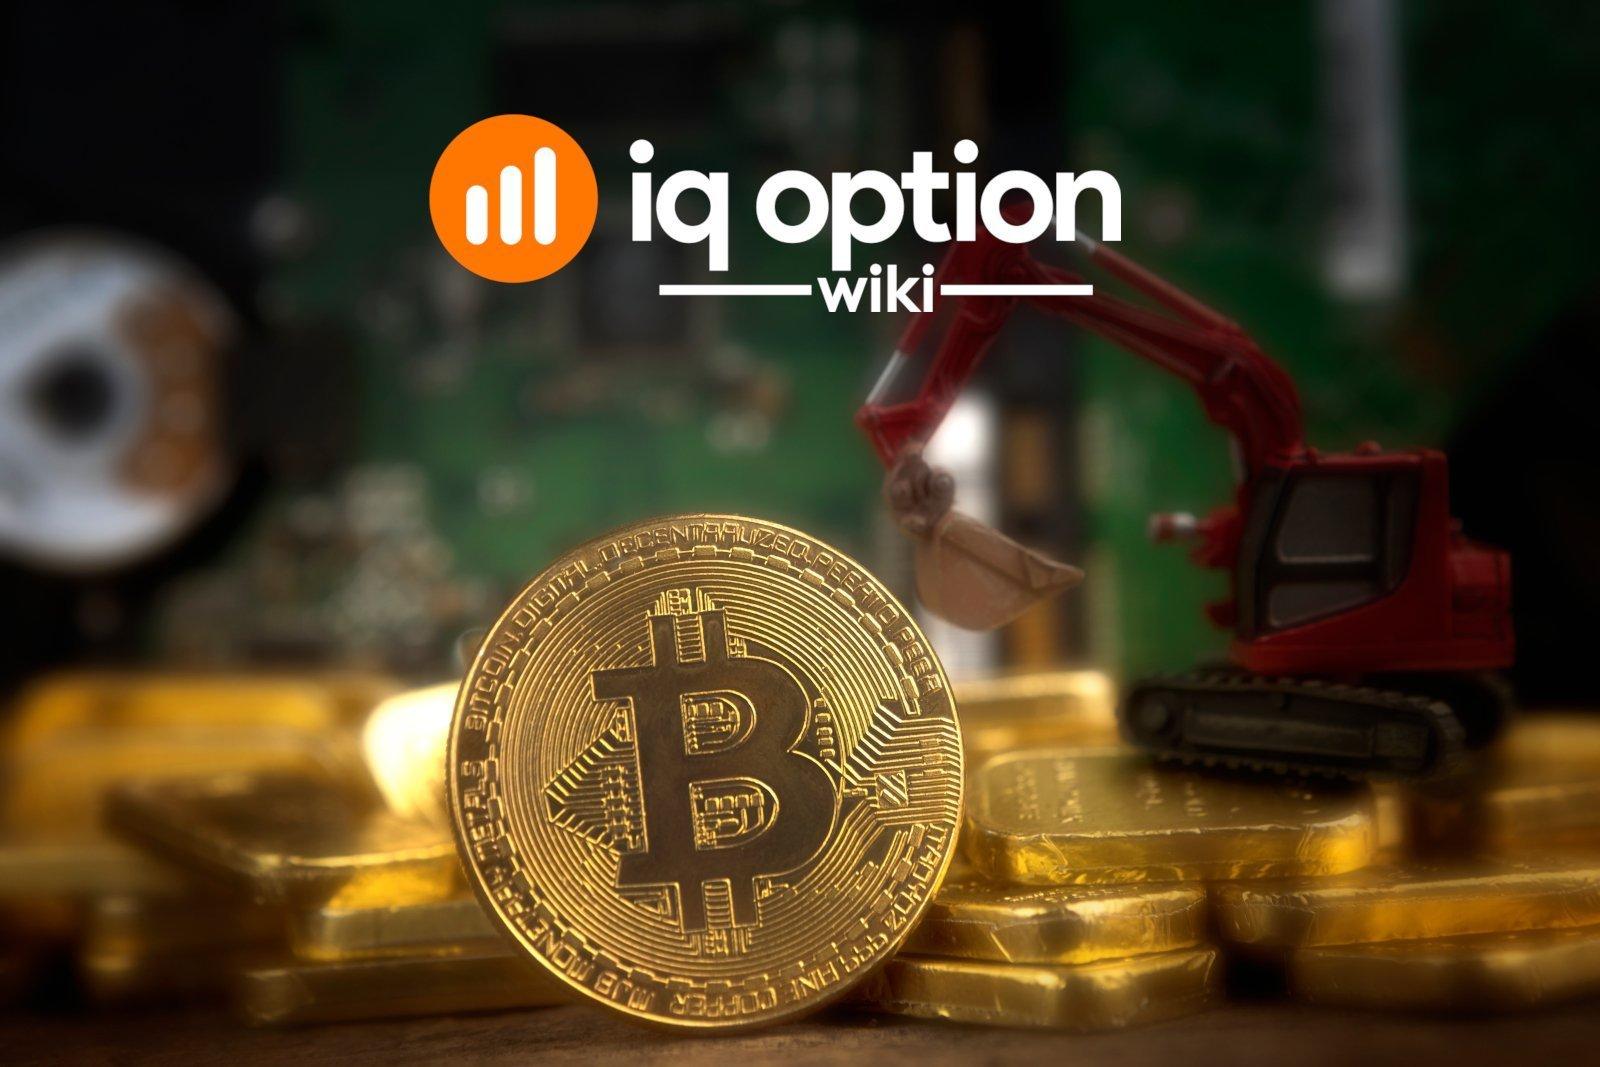 broker bitcoin arabia saudita quanto paga tiktok